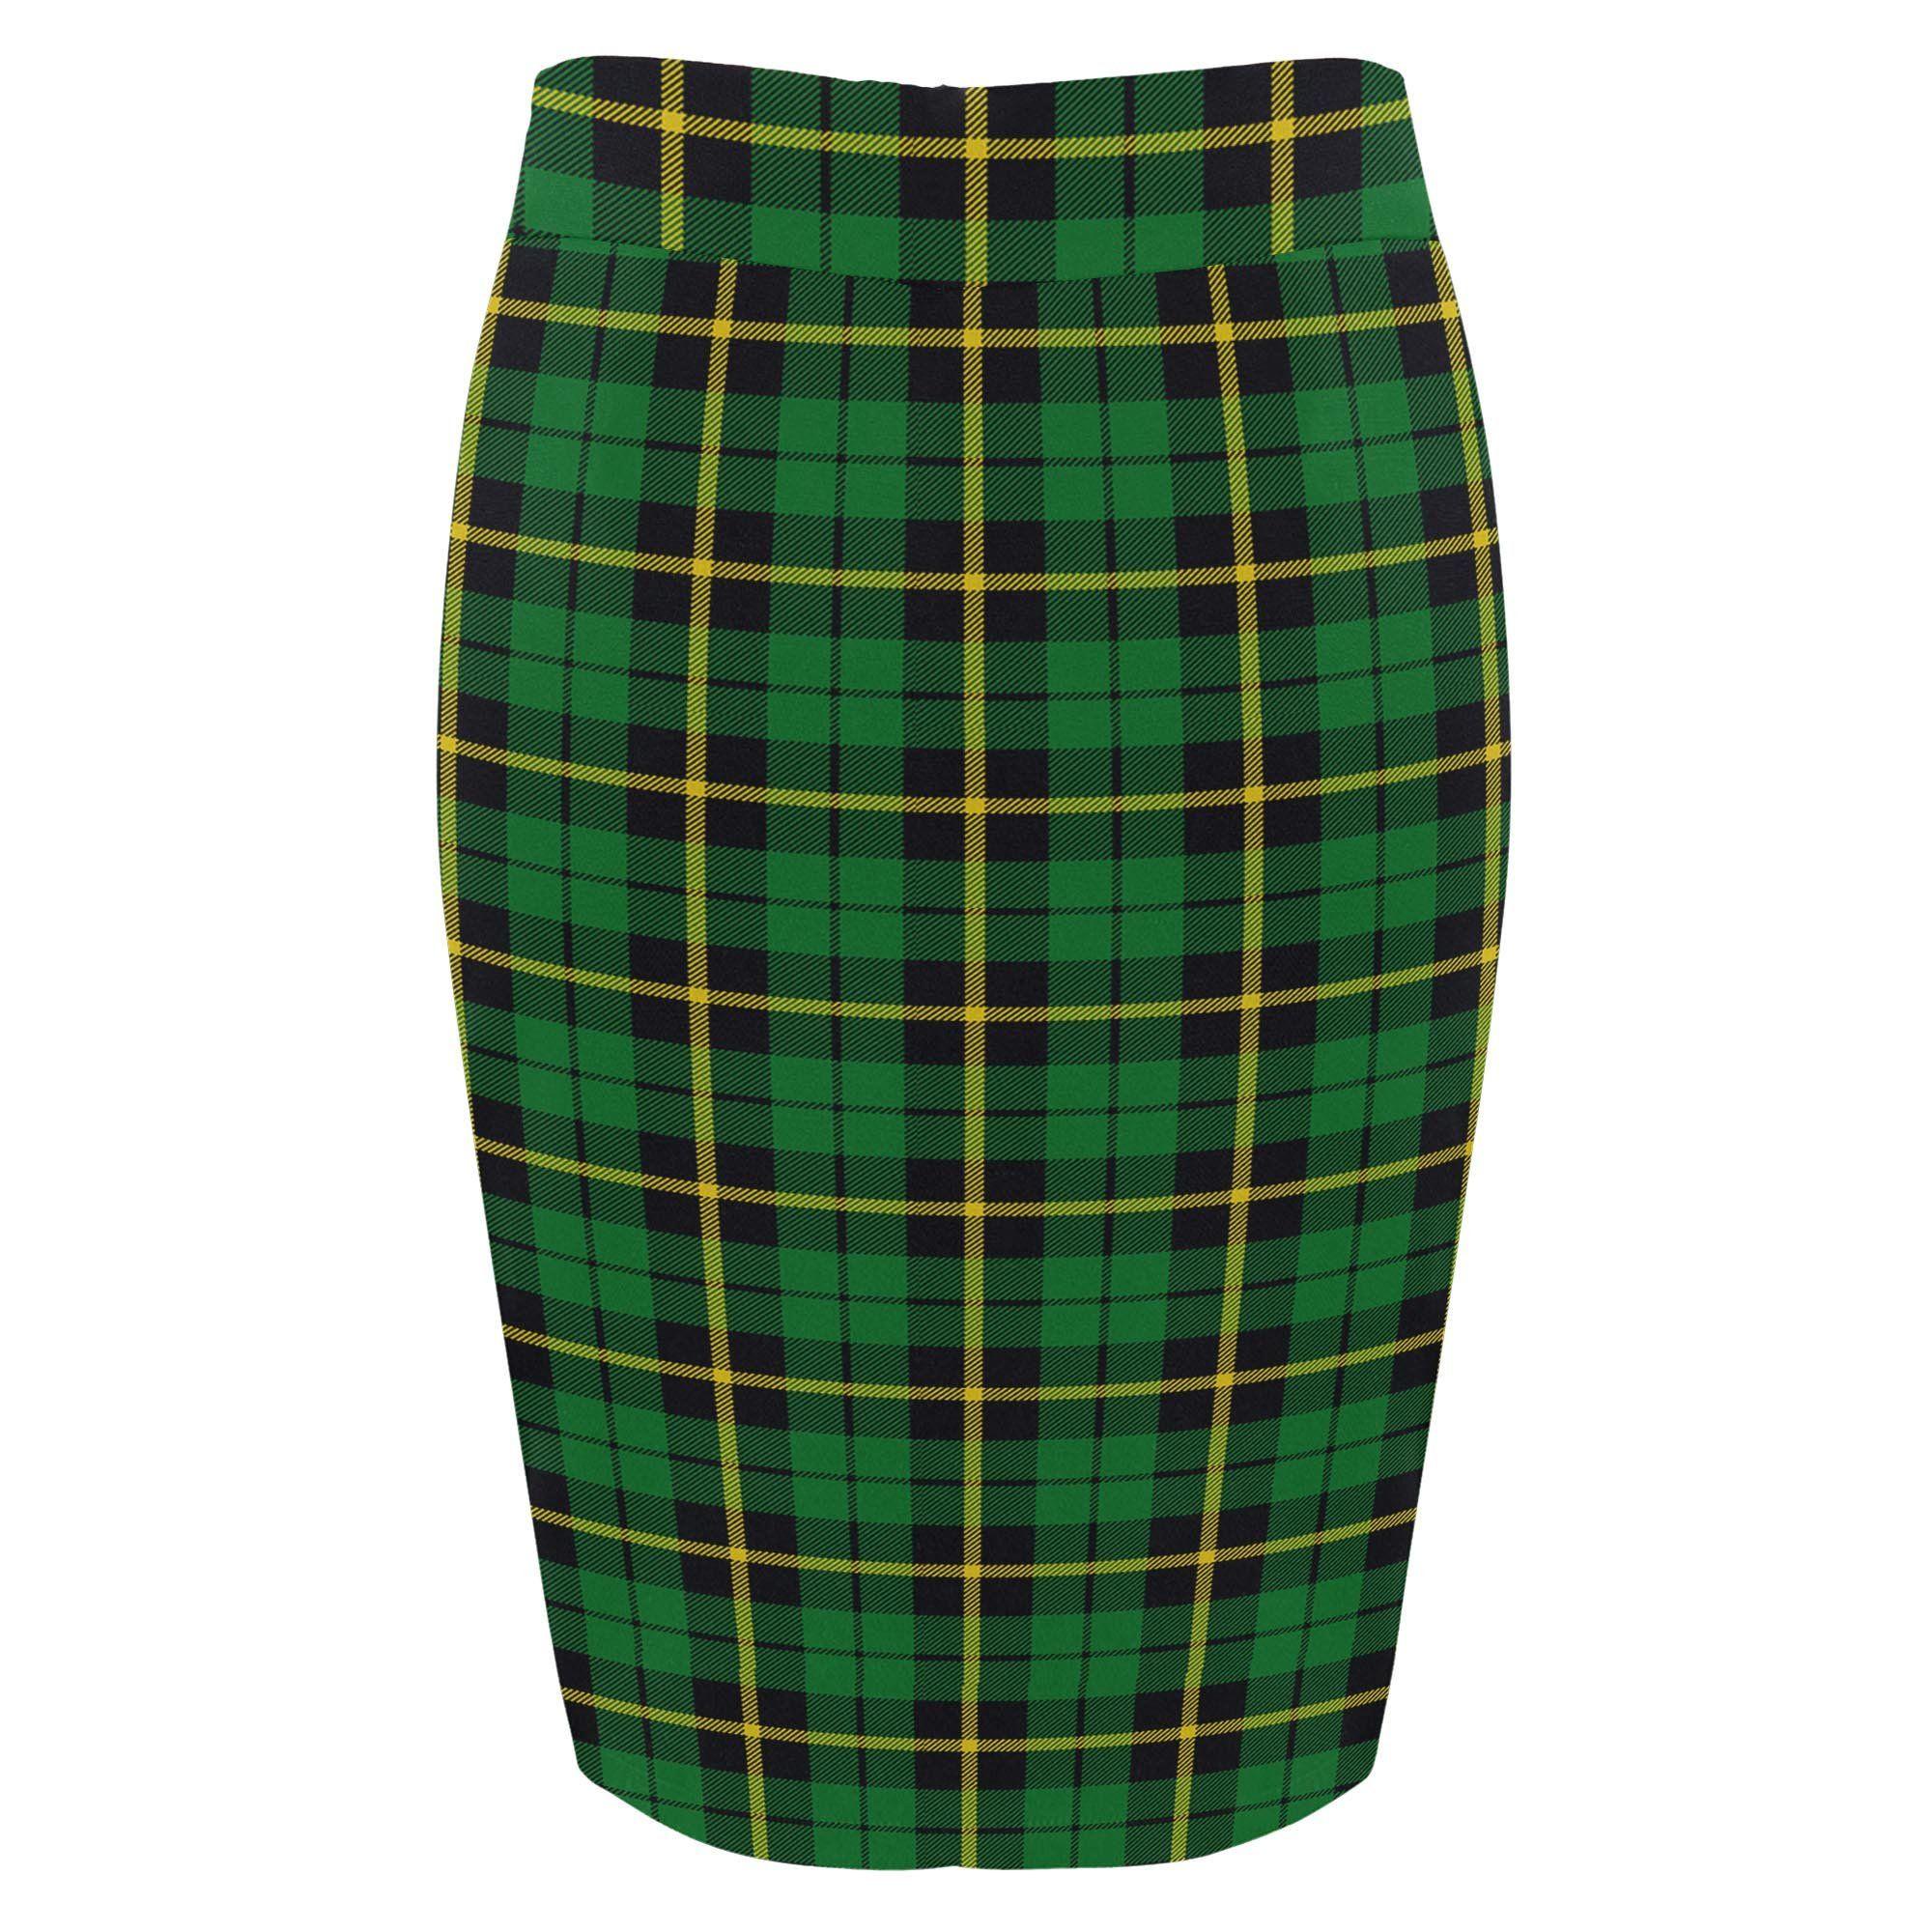 b88dd1e9b Tartan Skirt - Wallace Hunting - Green Fitted Skirt A9 in 2019 ...